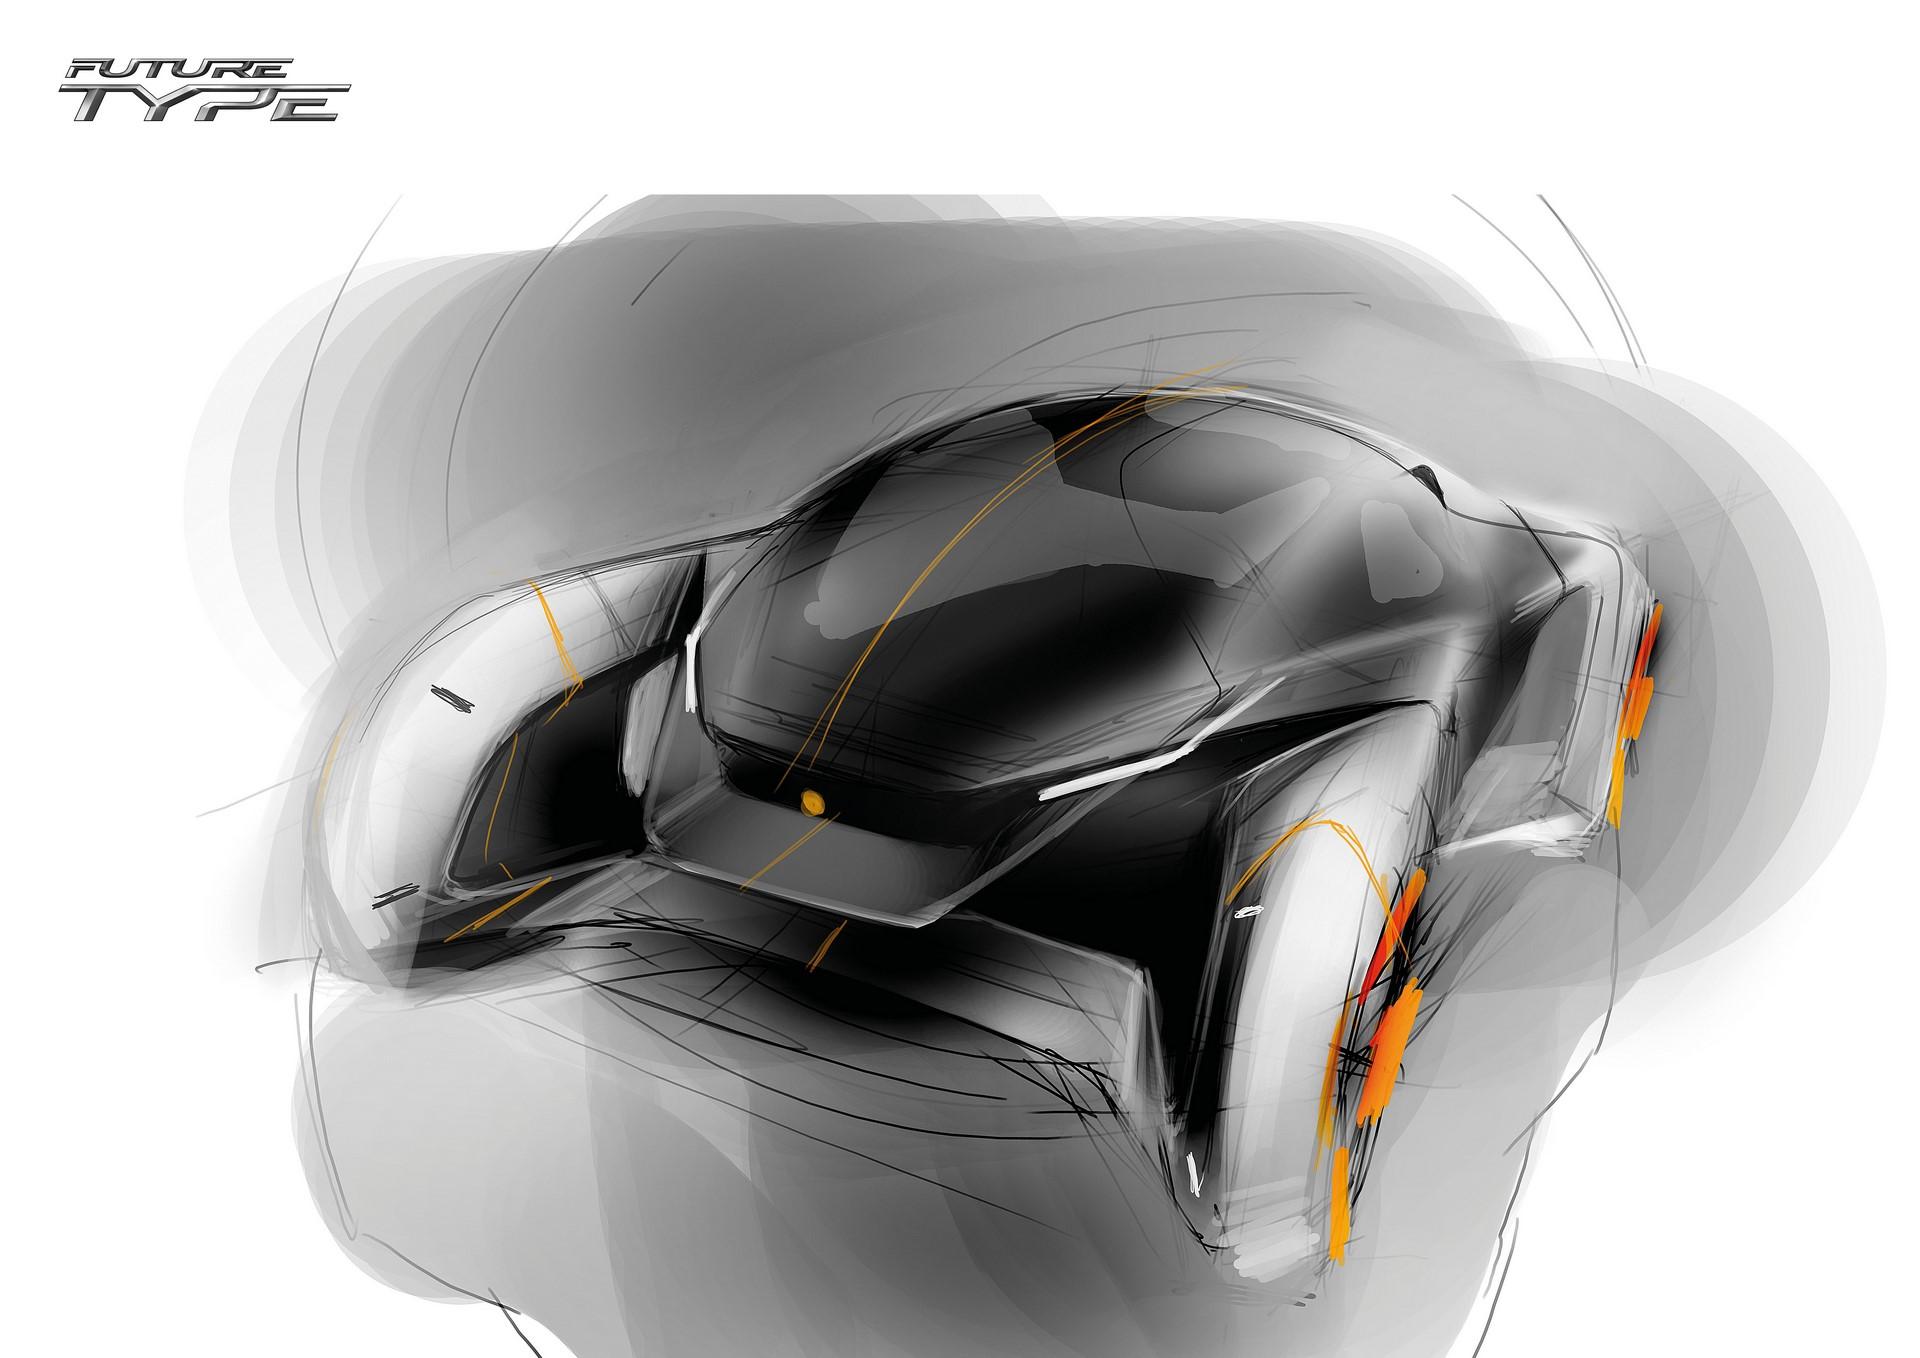 Future Type9